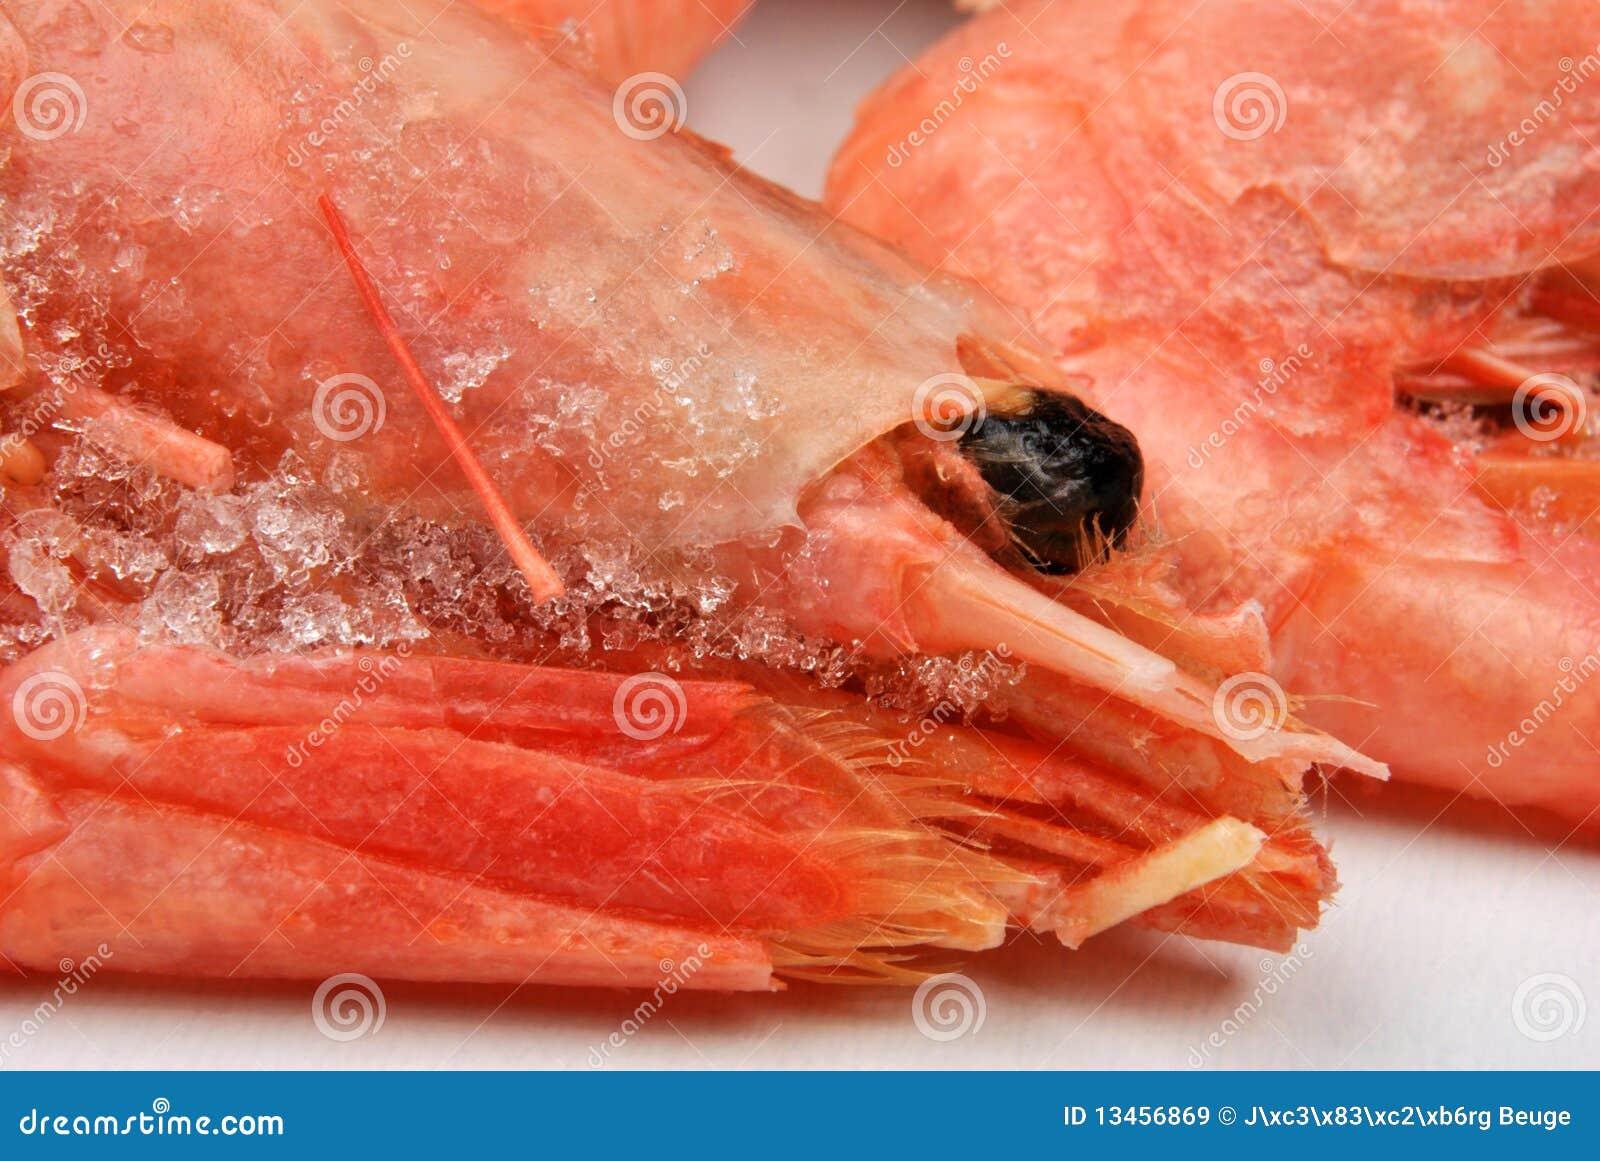 how to cook frozen prawns